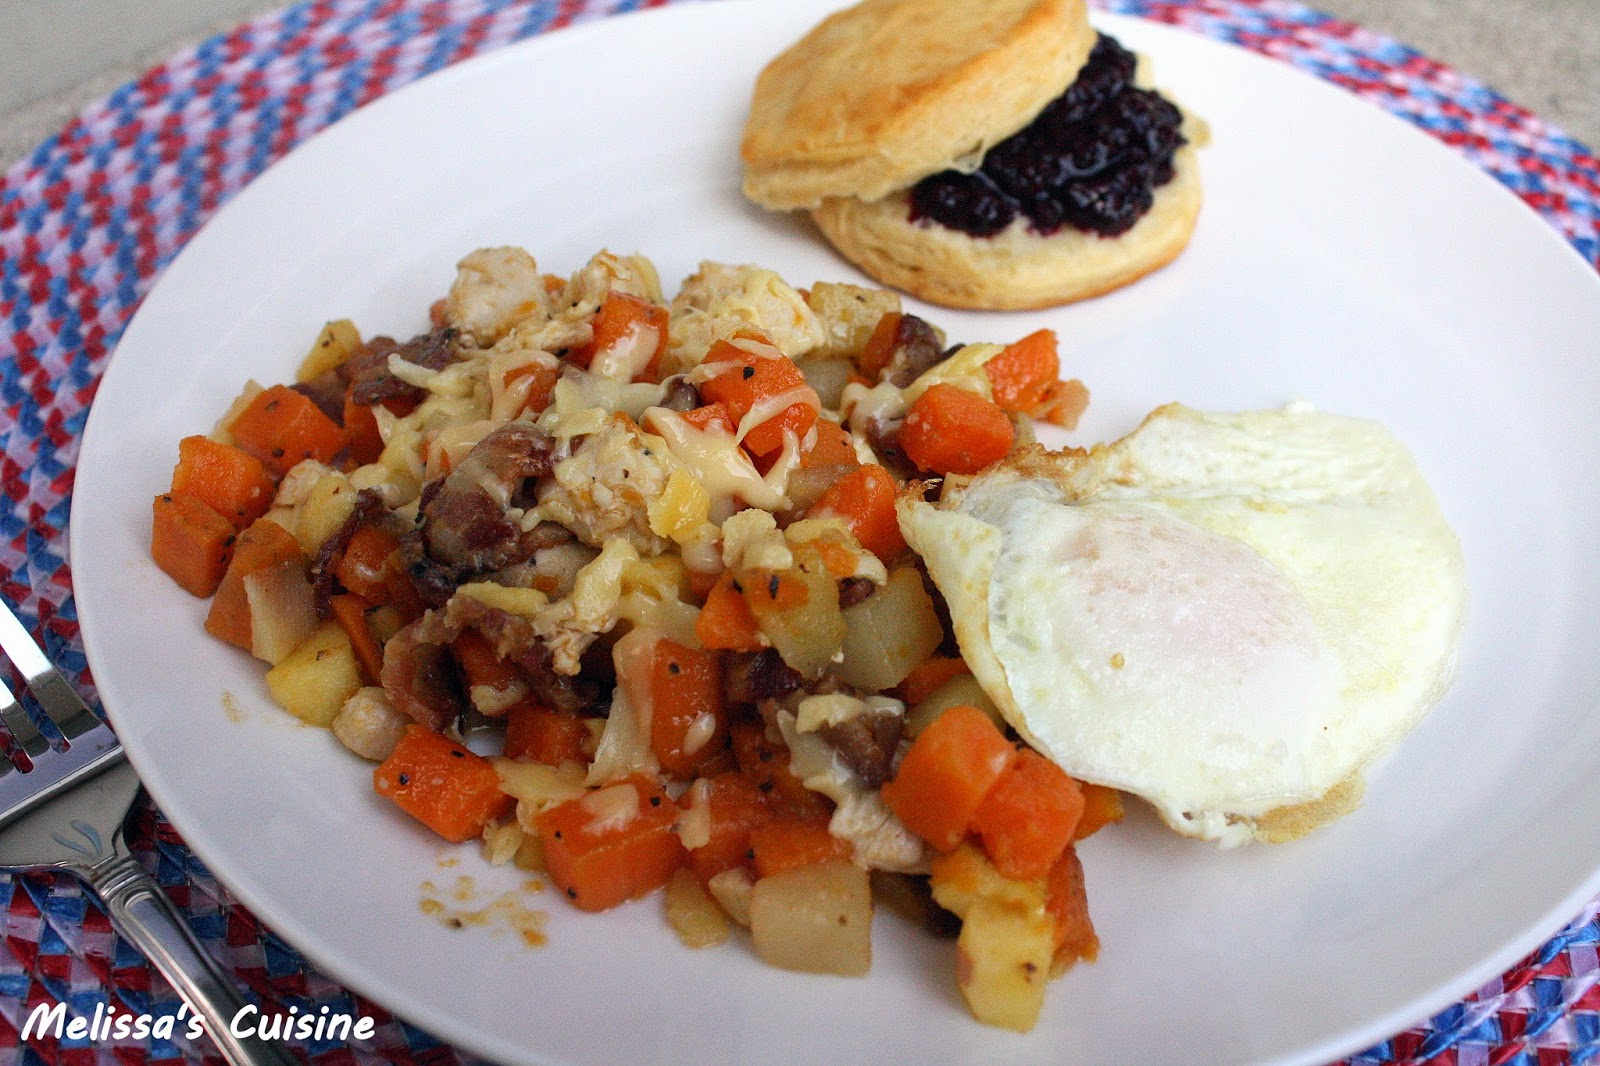 Melissa's Cuisine: Apple Chicken Potato Hash